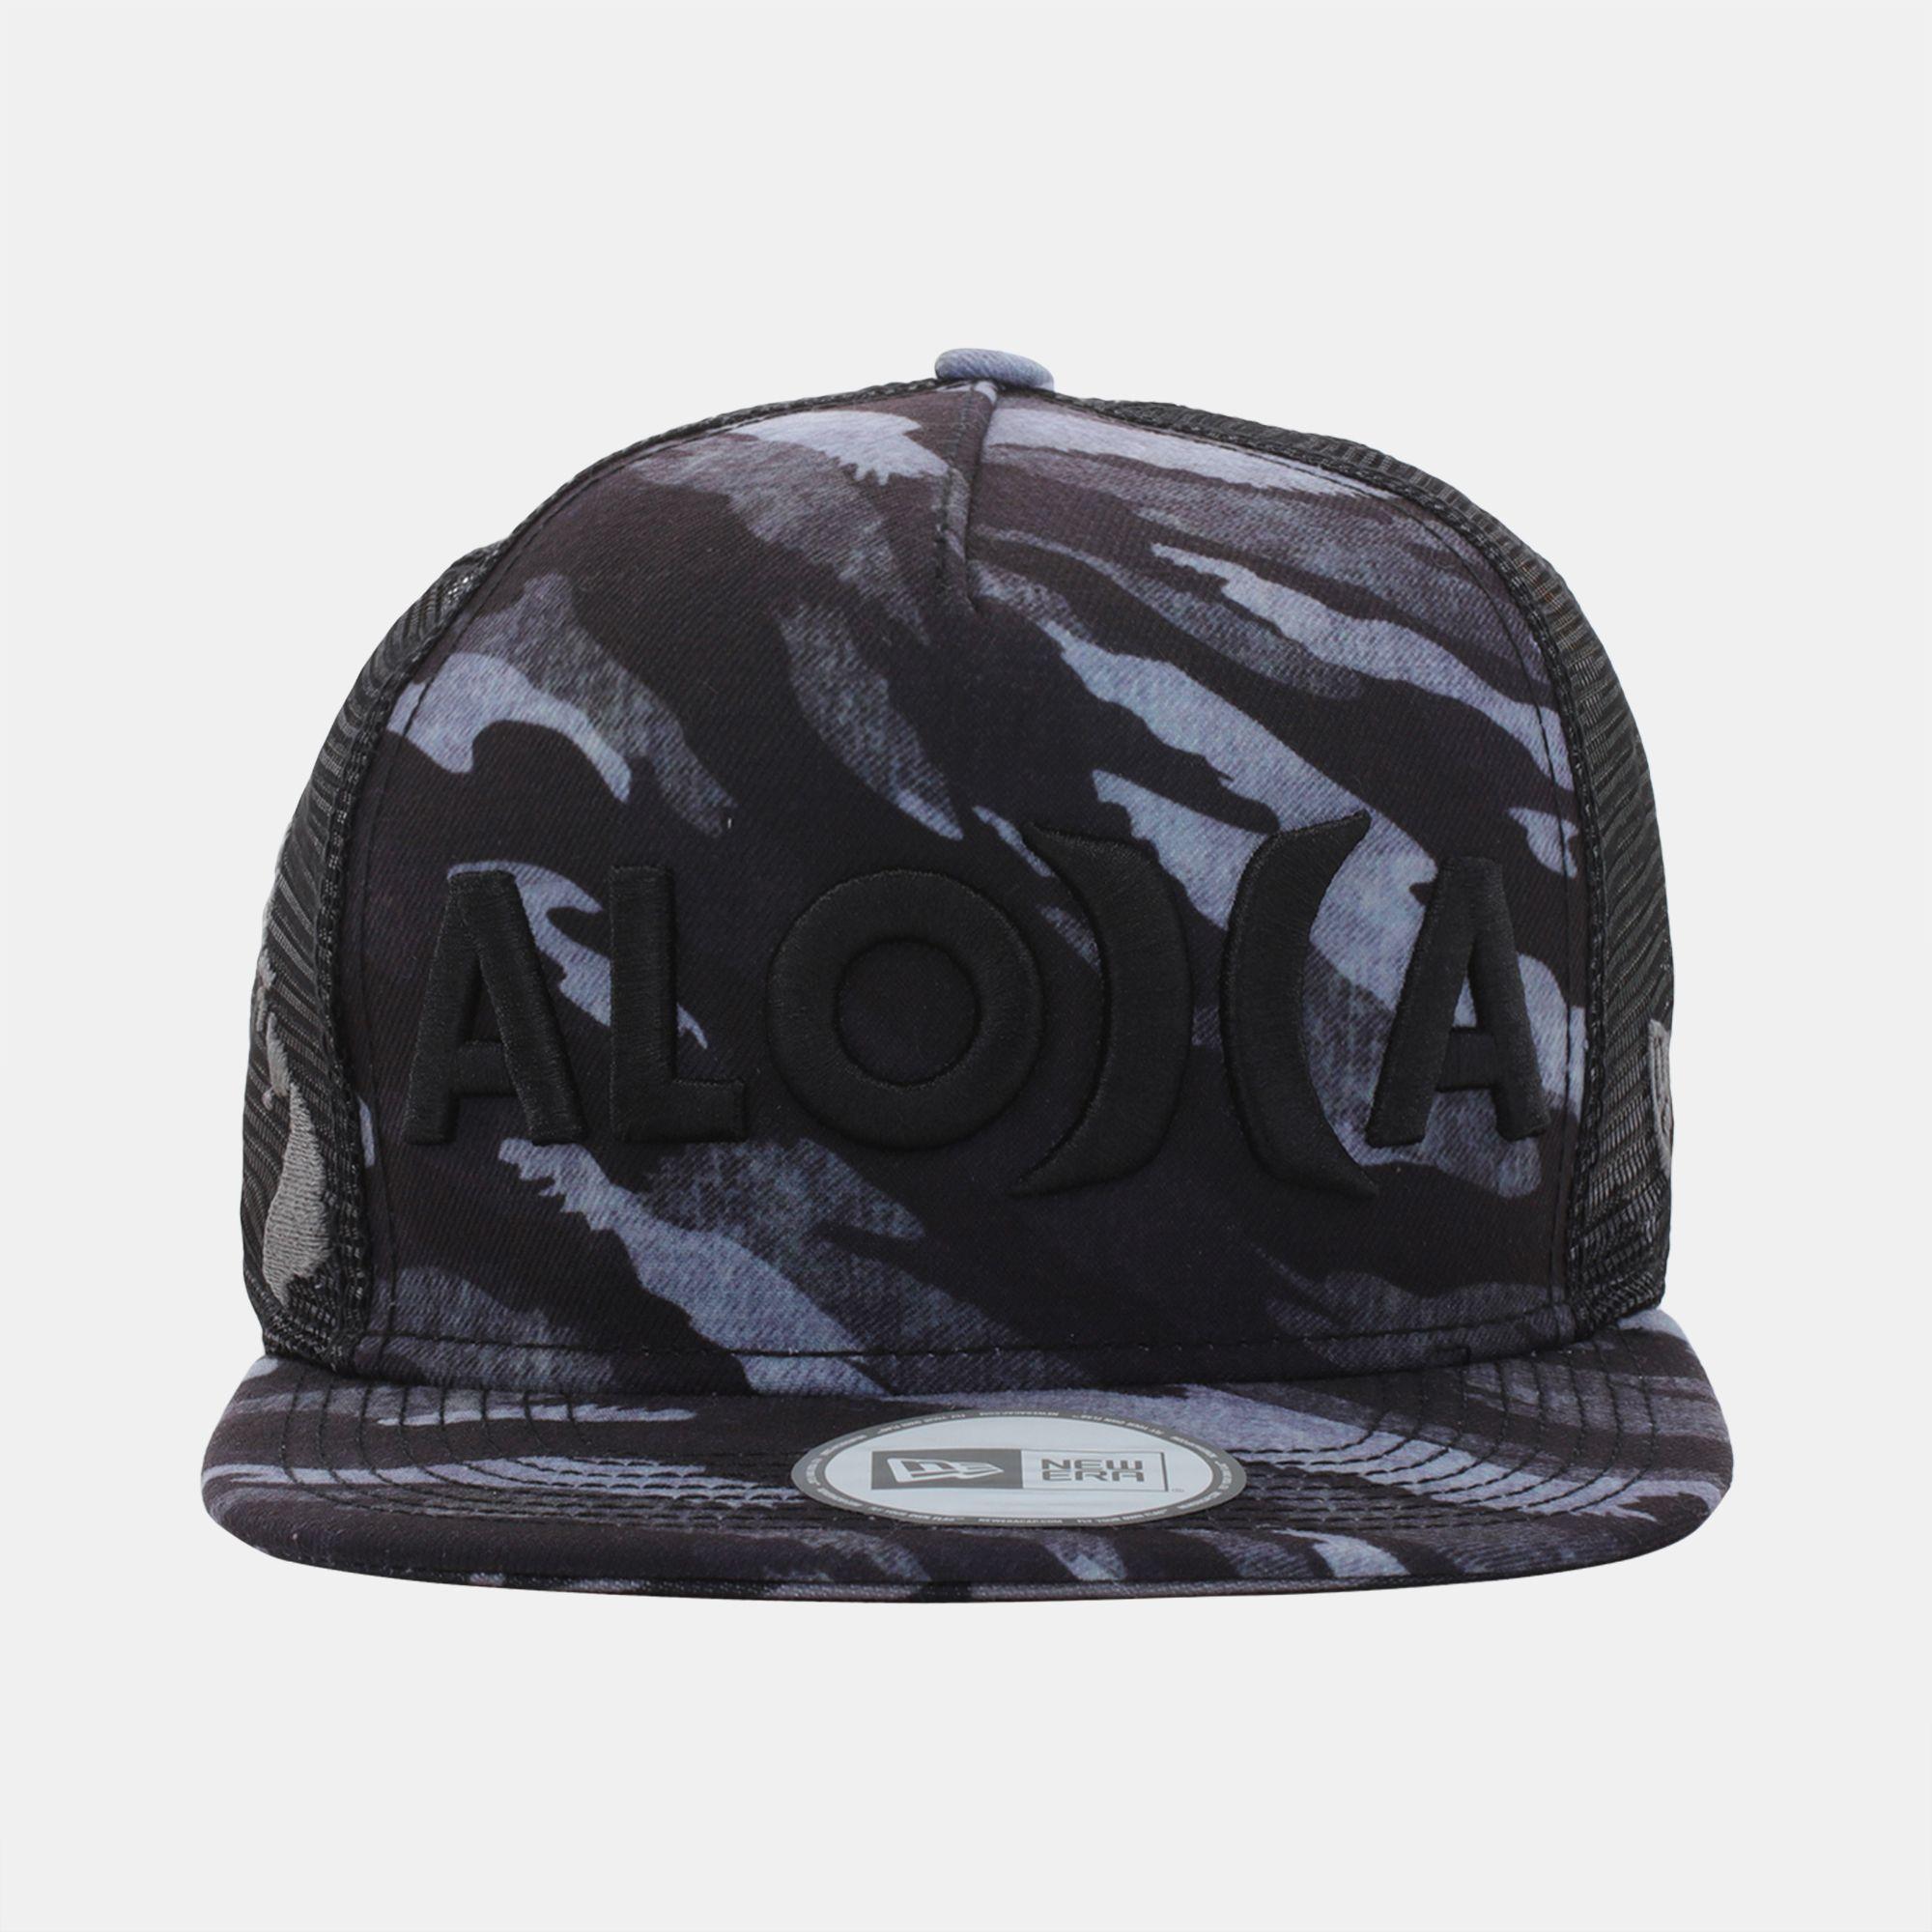 finest selection 03e33 ead99 ... sweden hurley elite flow aloha hat black 5156c 2db08